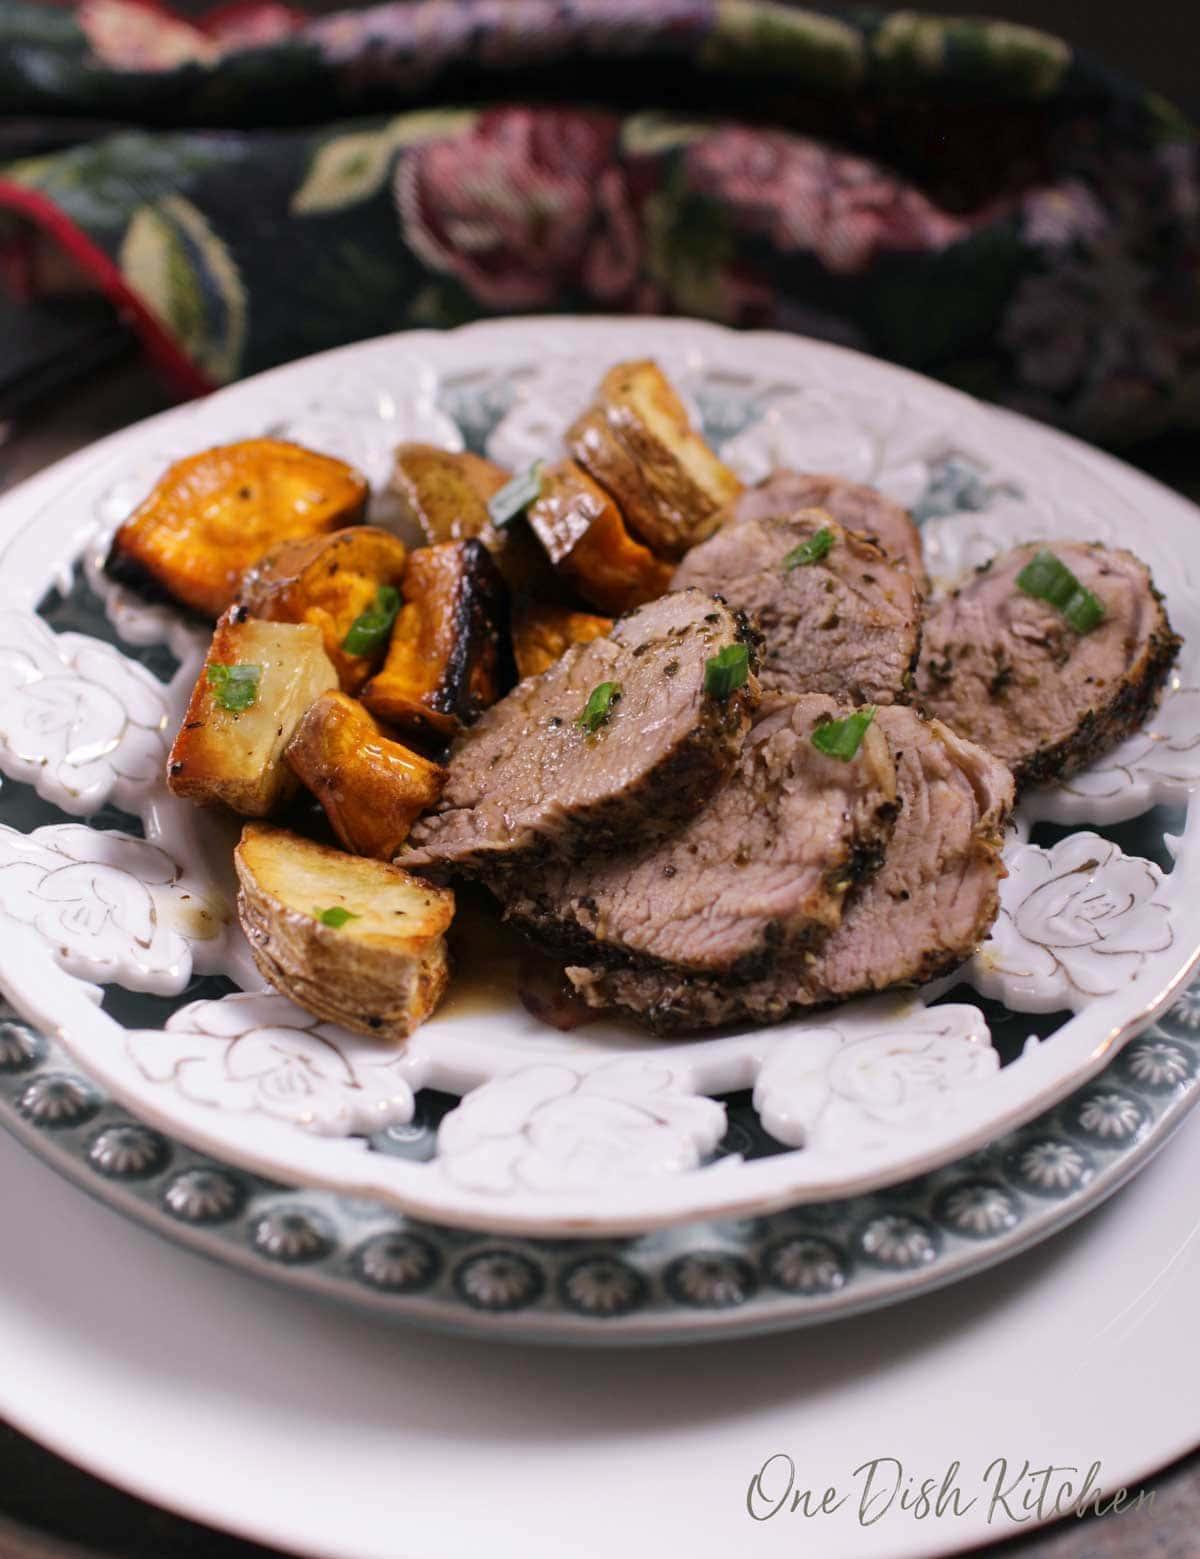 Sliced pork tenderloin and sliced roasted potatoes on a plate.